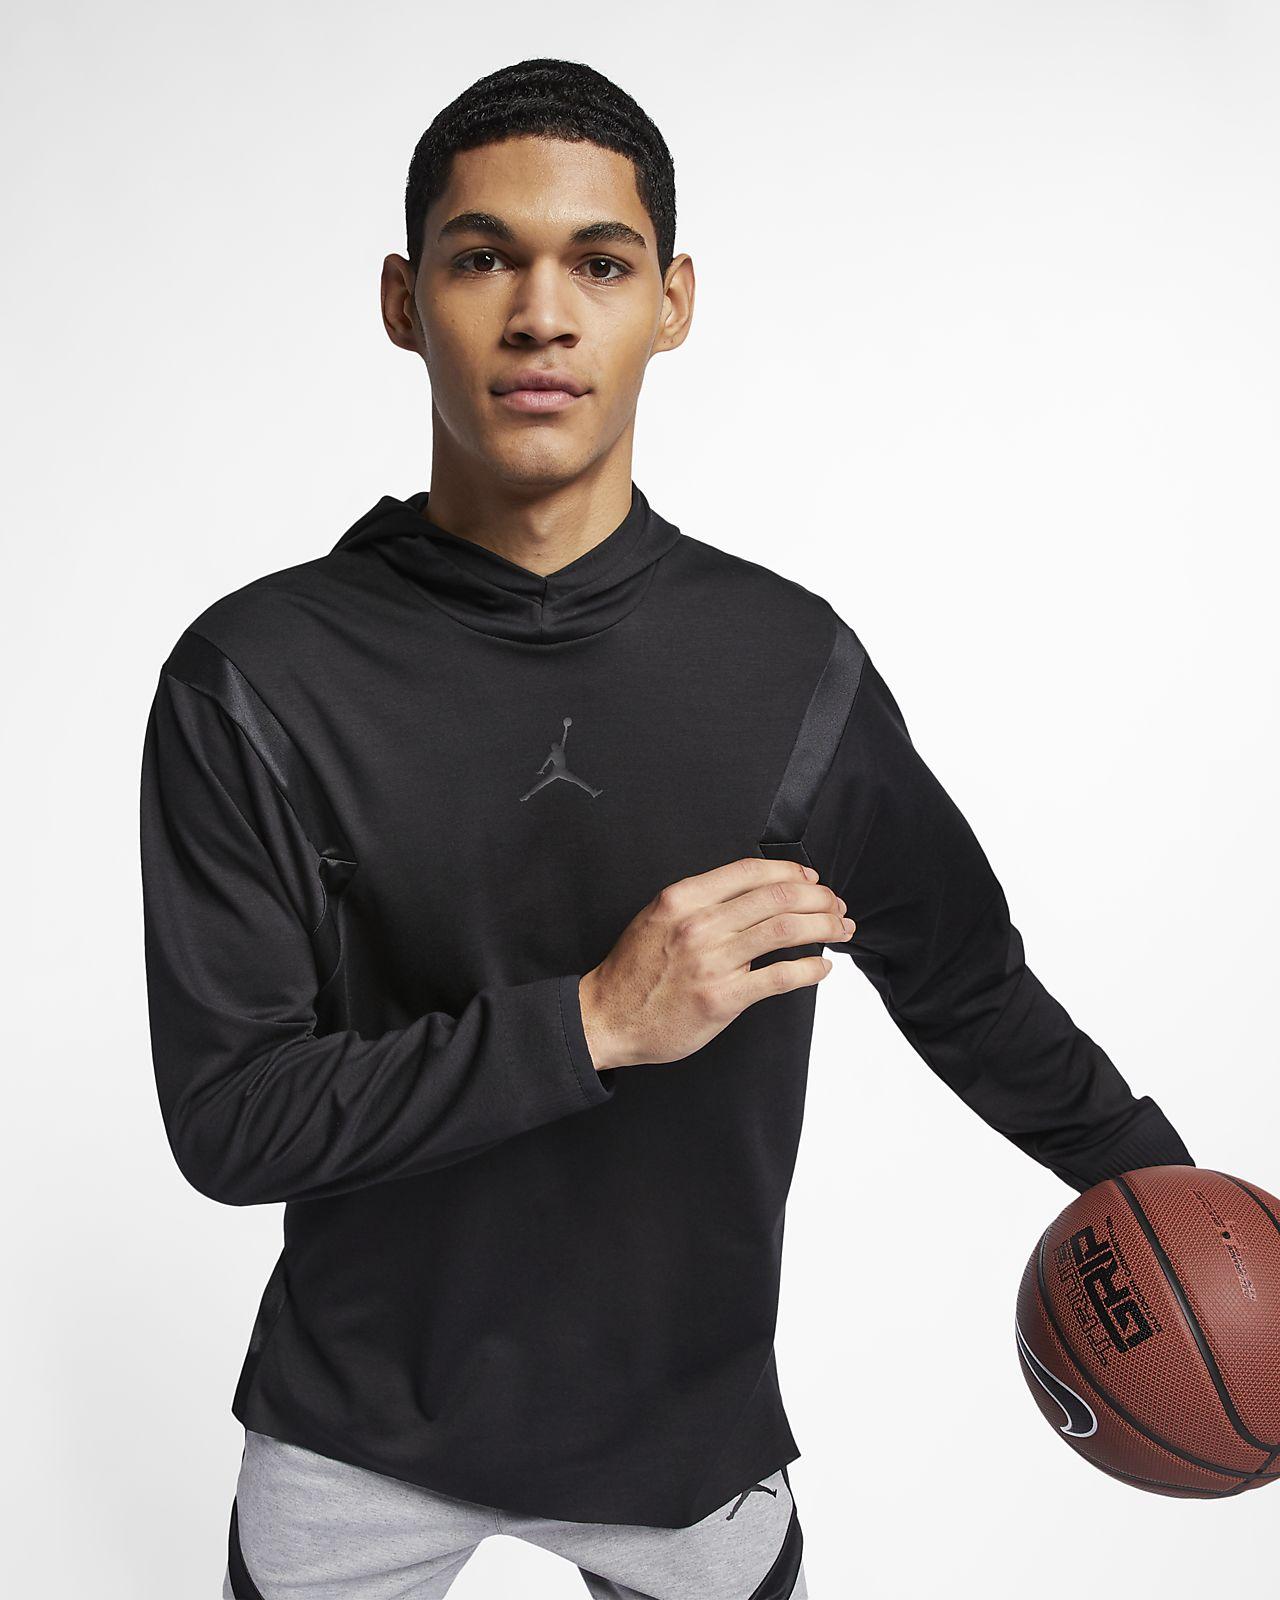 Jordan Game Shoe Men's Basketball Top